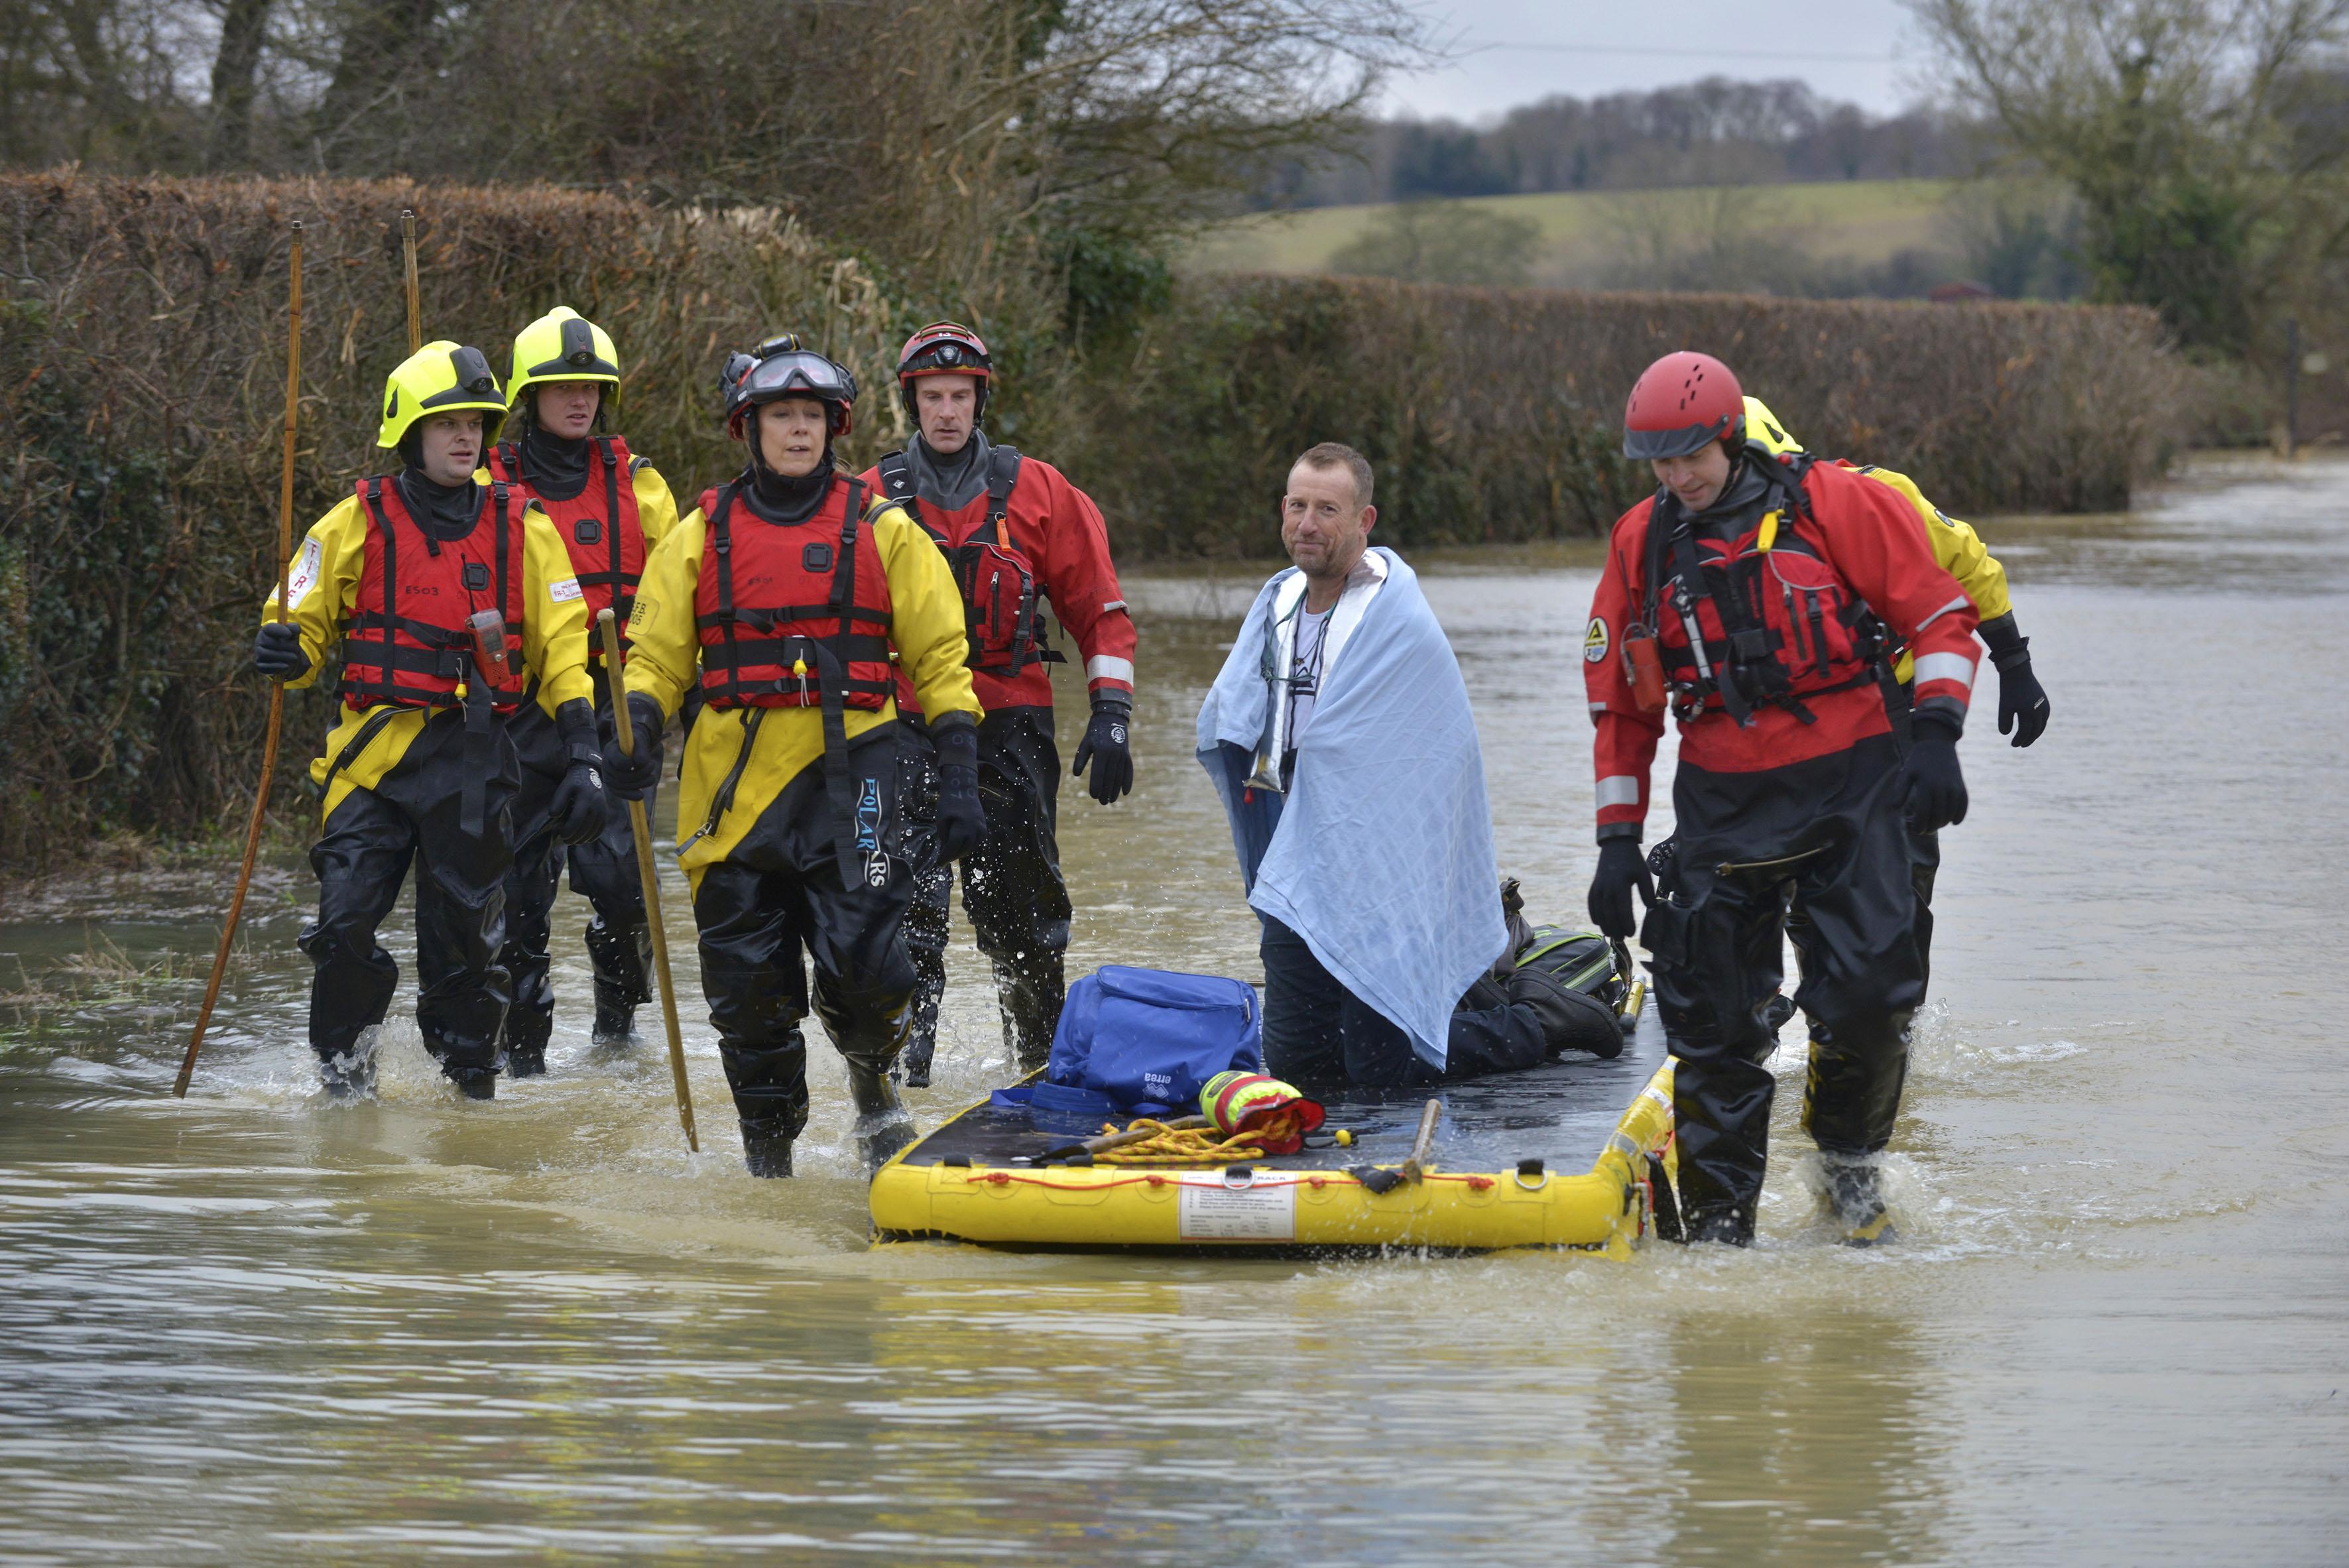 Barcombe Mills flood